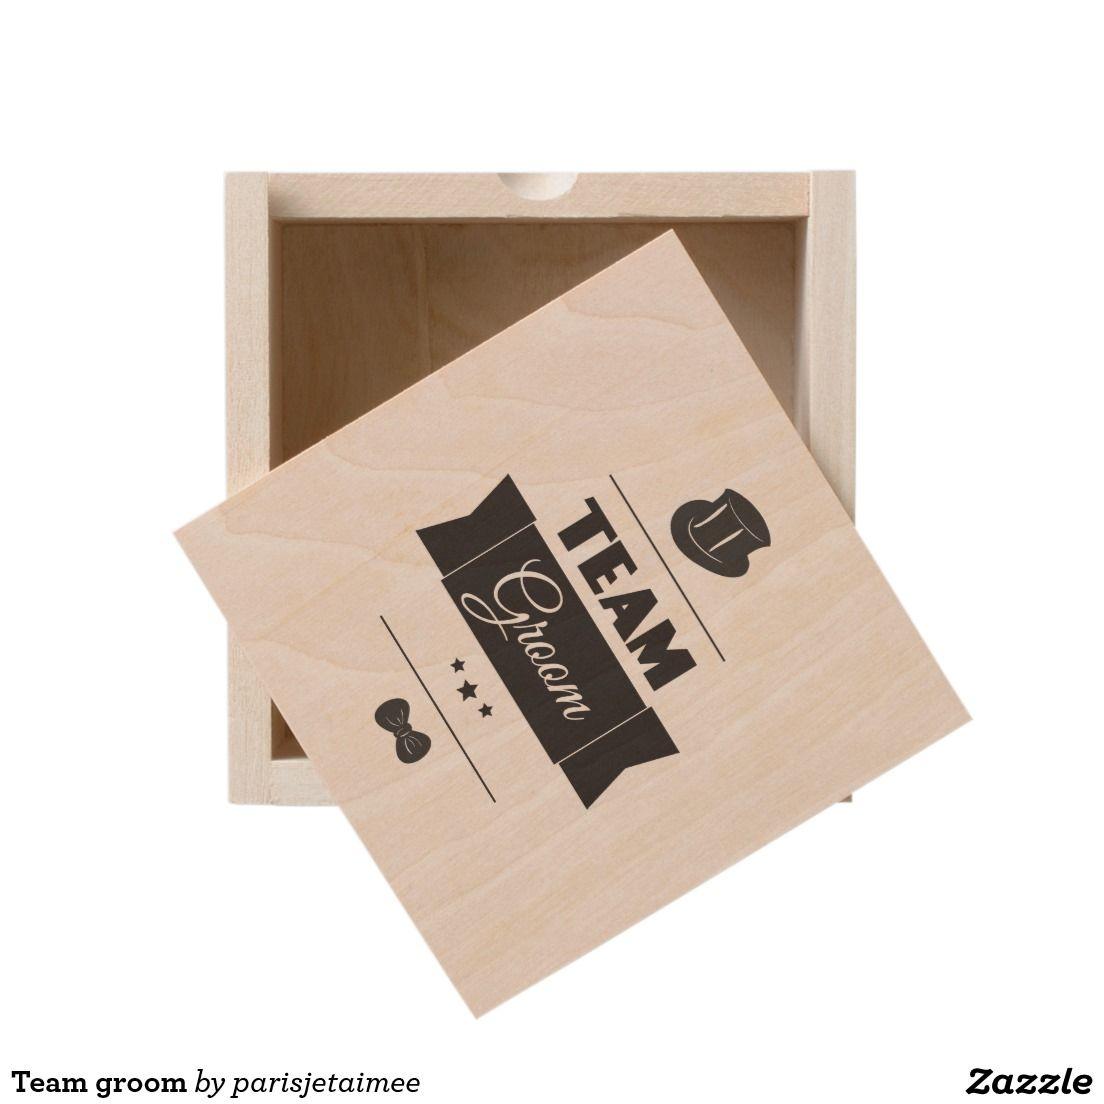 Team groom wooden keepsake box #wedding #groom #teamgroom #groom #funny #cool #bachelorparty #vintage #hipster #bride #engagement #funnygroom #sunglasses #hat #bowtie #groomgift #bachelorgift #weddingparty #bestman #fun